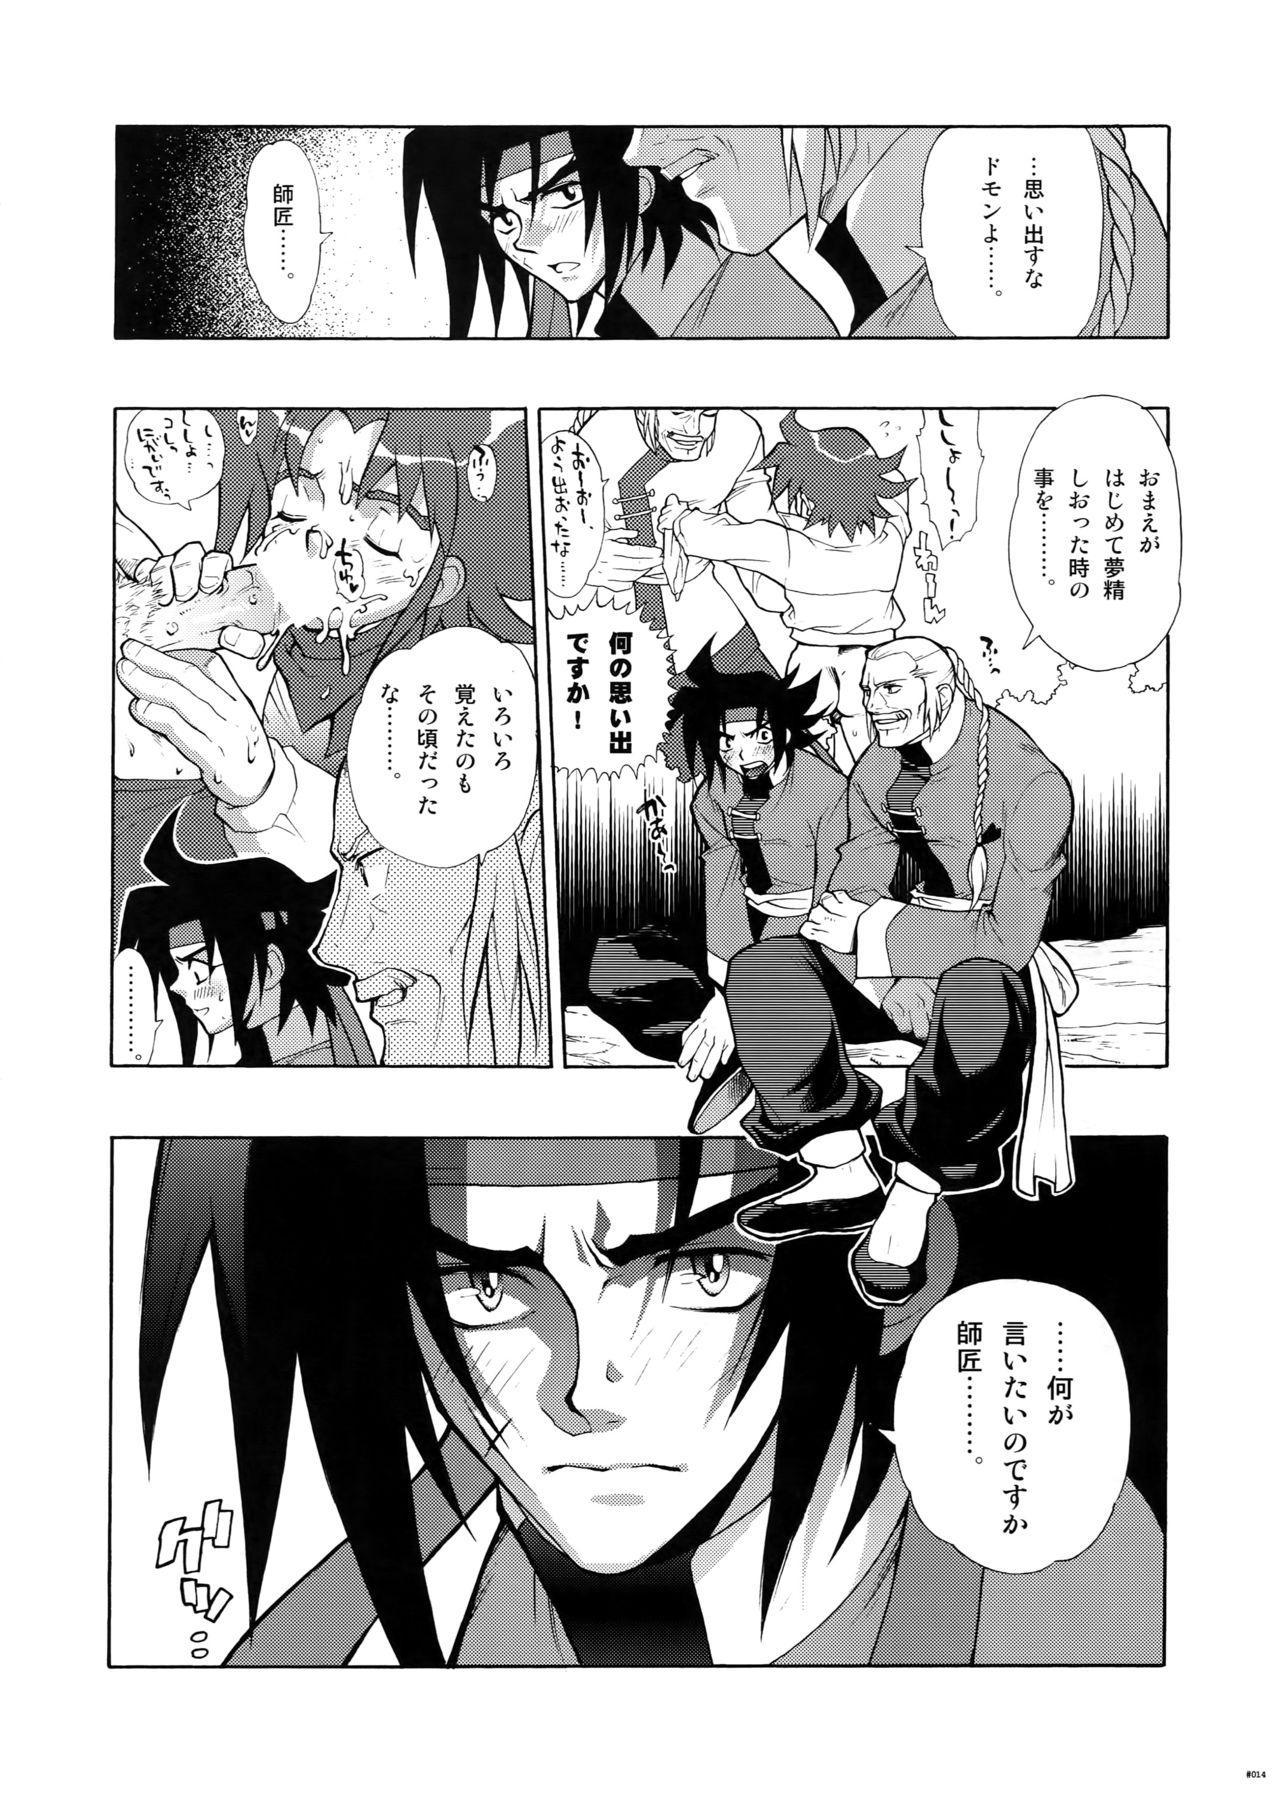 [Article 60 of Criminal Code (Shuhan)] G-gan Josei-Muke Sairoku-Shuu (G Gundam) 13